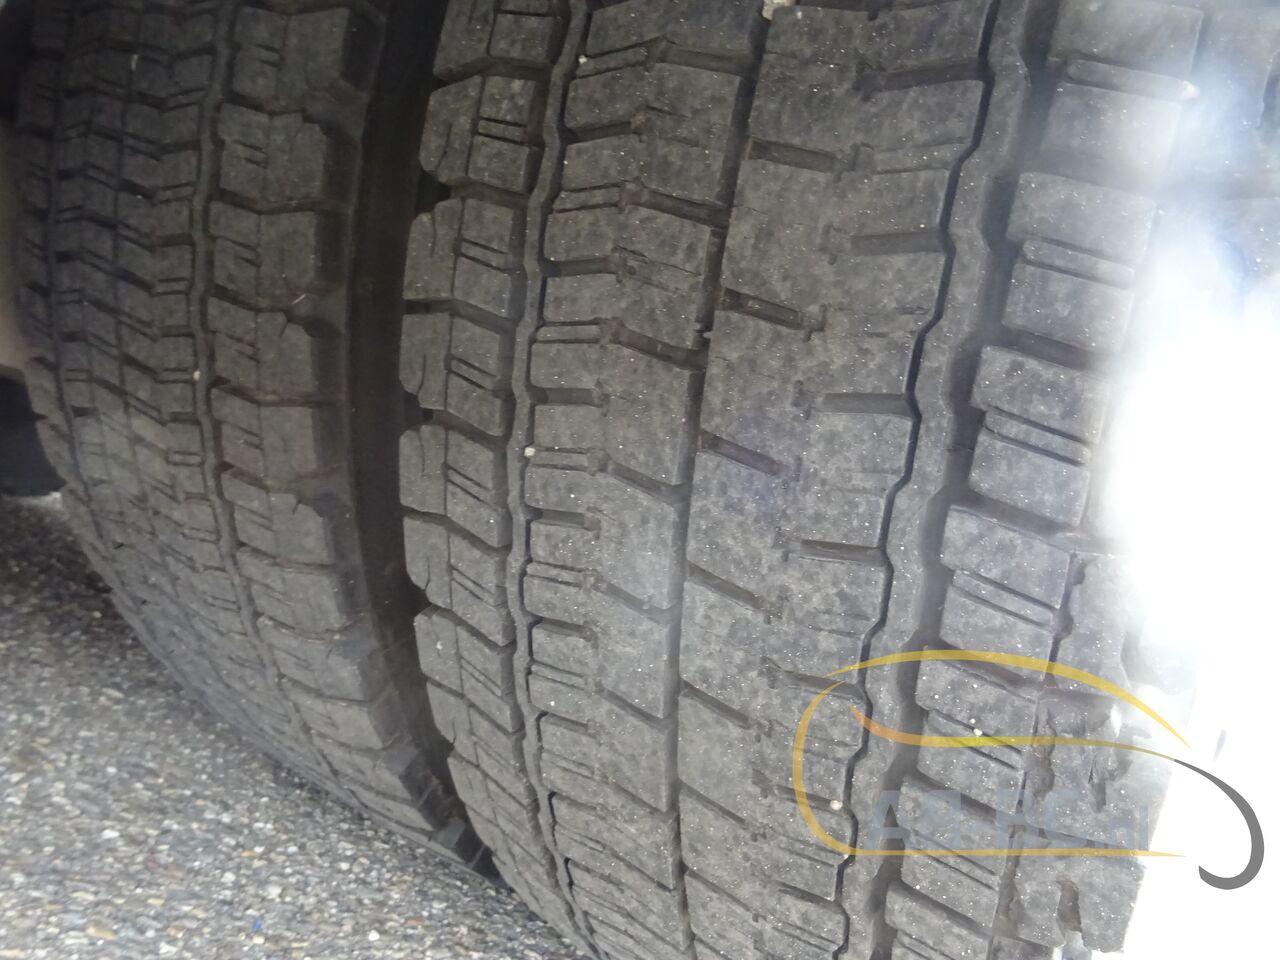 coach-busSETRA-S415-GT-HD-FINAL-EDITION---1627457039941020349_big_e7c8a8357bfdf6437f40919a25ee6db9--21050713010665719300